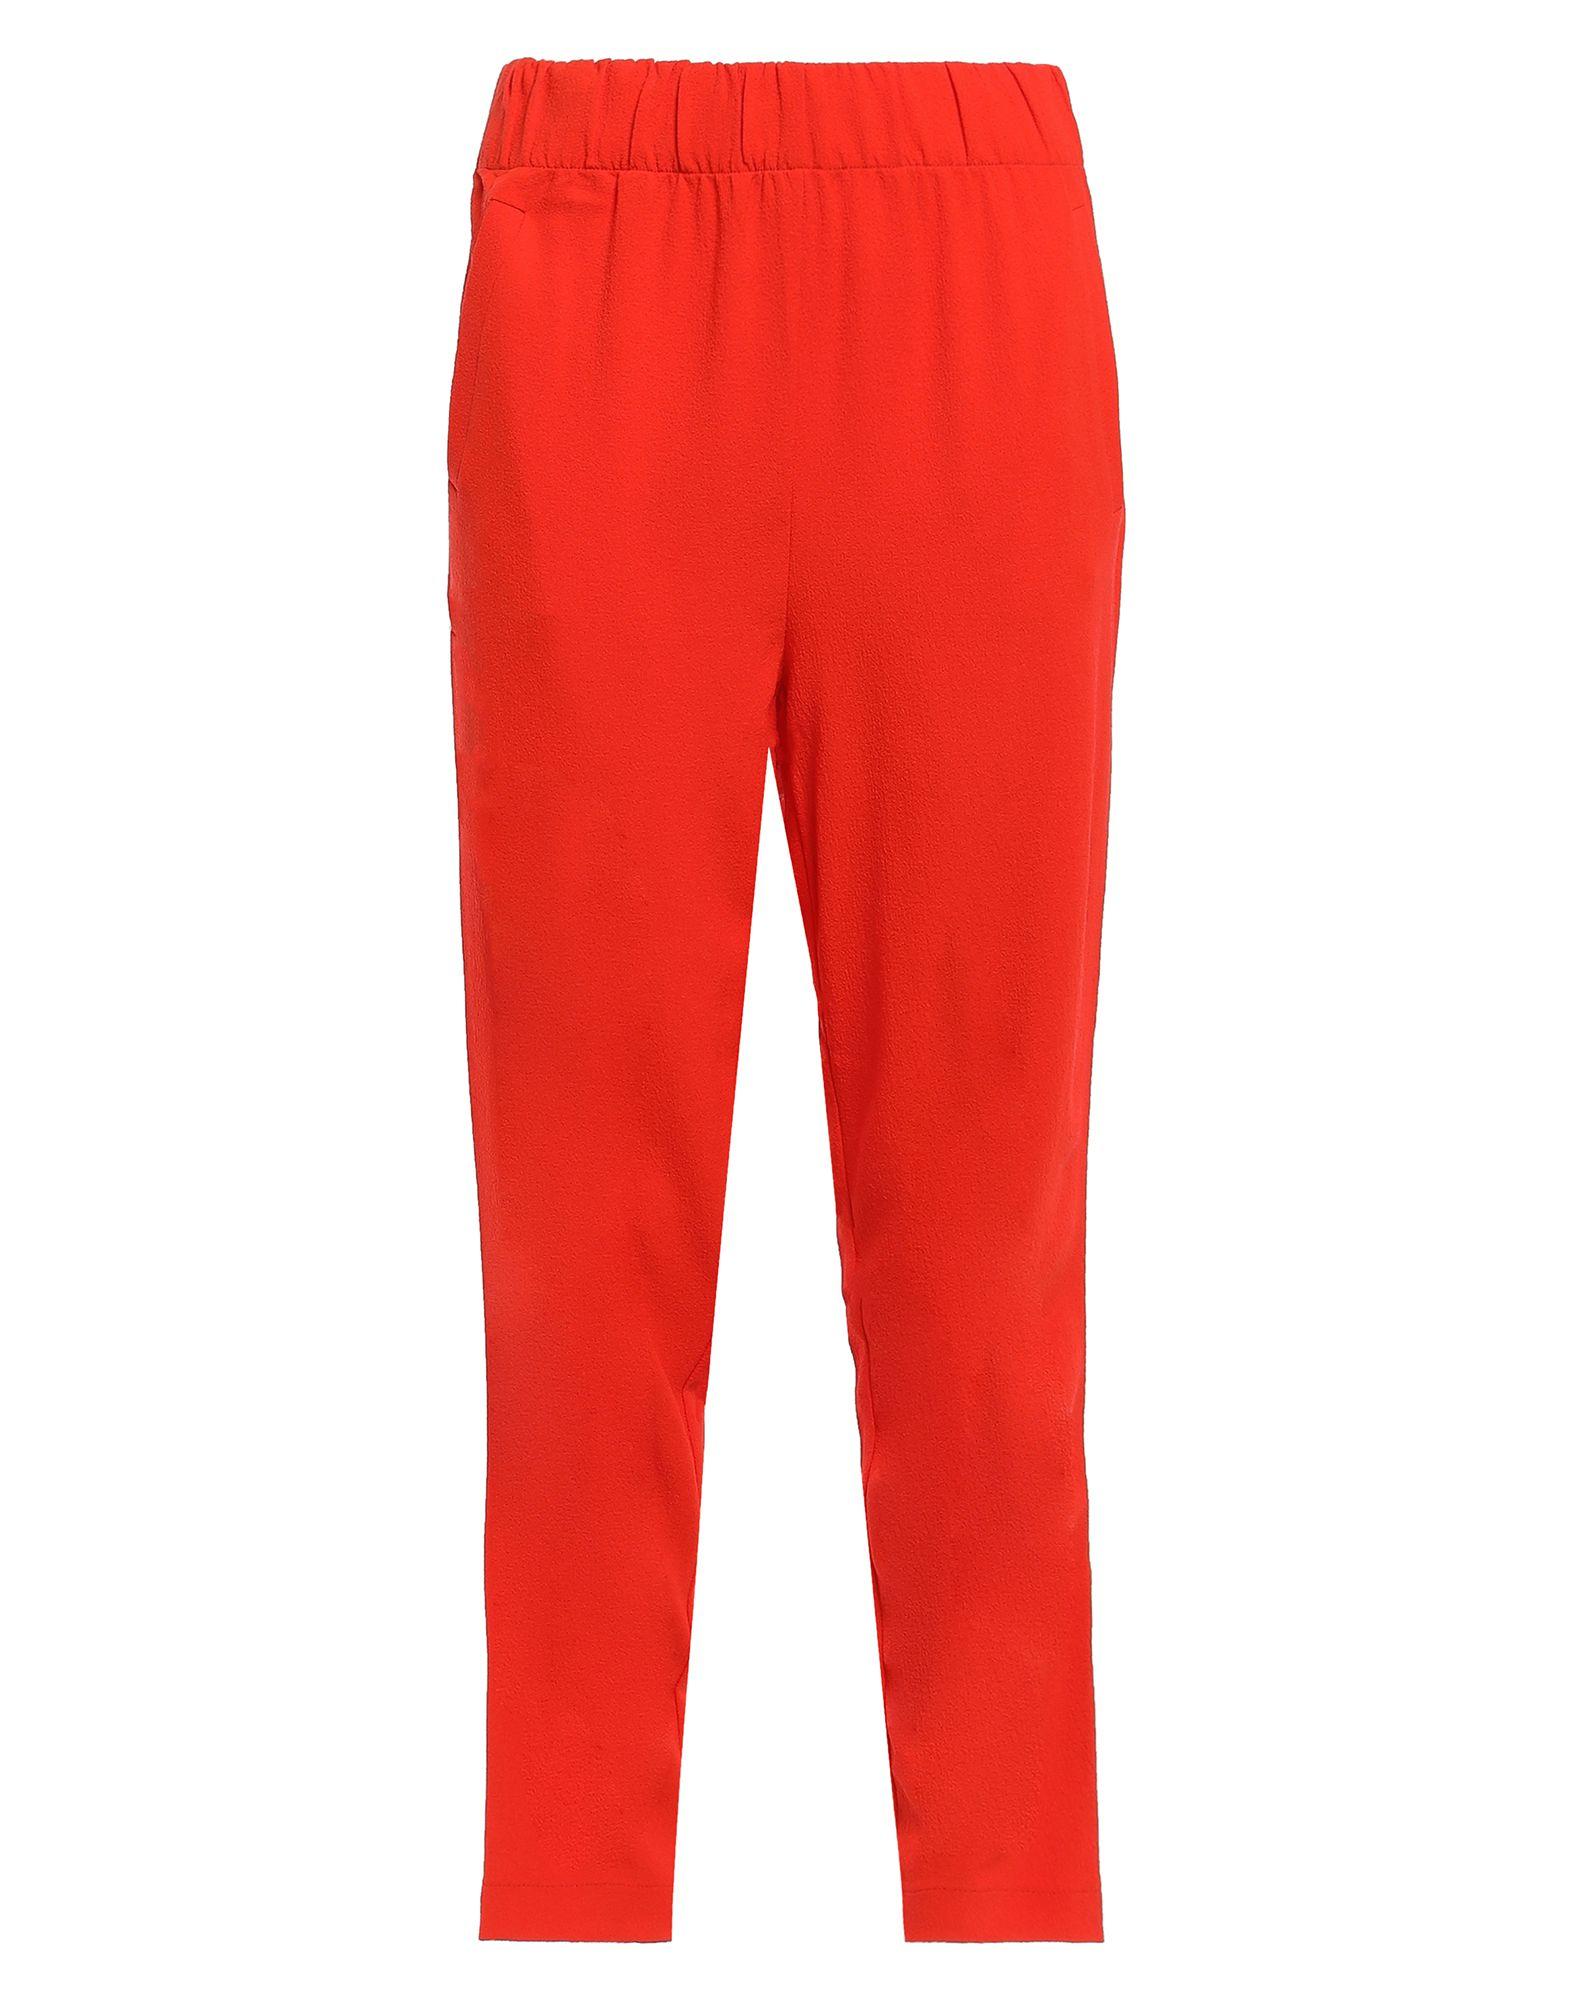 GANNI Casual pants. crepe, basic solid color, no appliqués, high waisted, regular fit, tapered leg, elasticized waist, multipockets, zips at hem, stretch. 97% Polyester, 3% Elastane